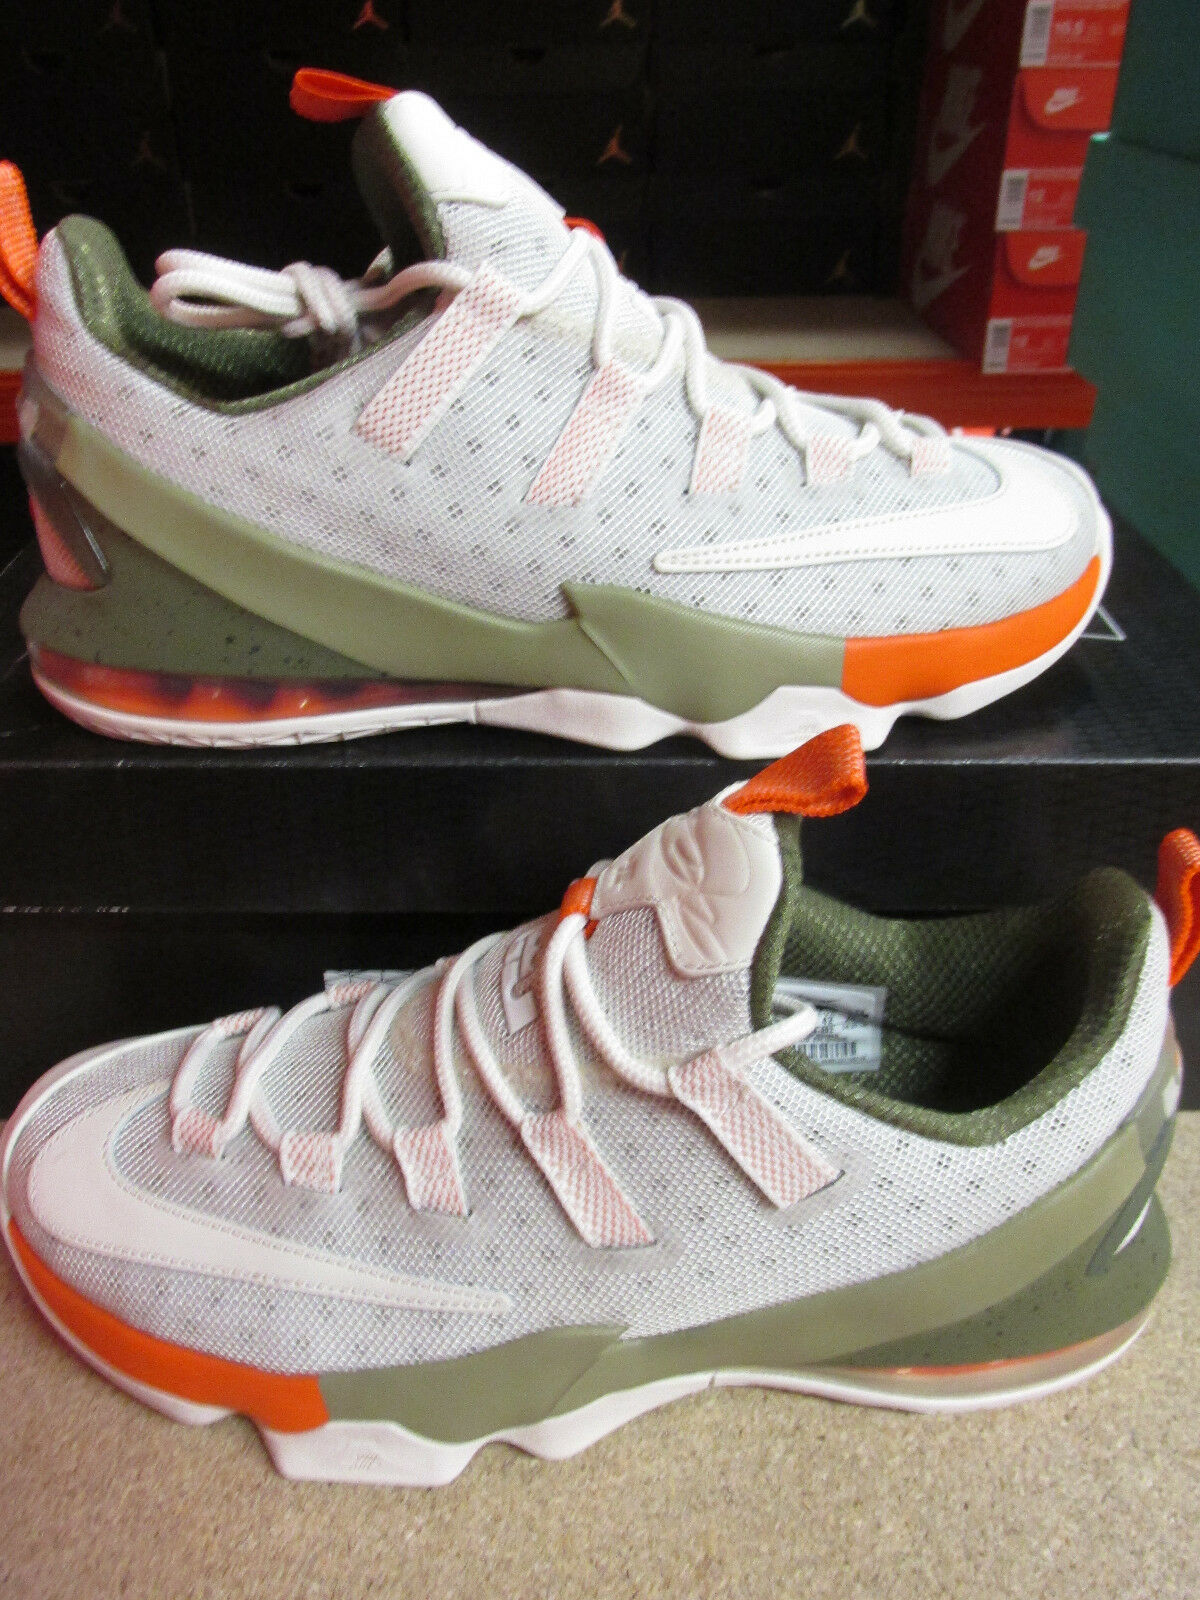 Nike basketball - trainer 849783 lebron xiii xiii xiii niedrigen mens 002 Turnschuhe, schuhe 749813